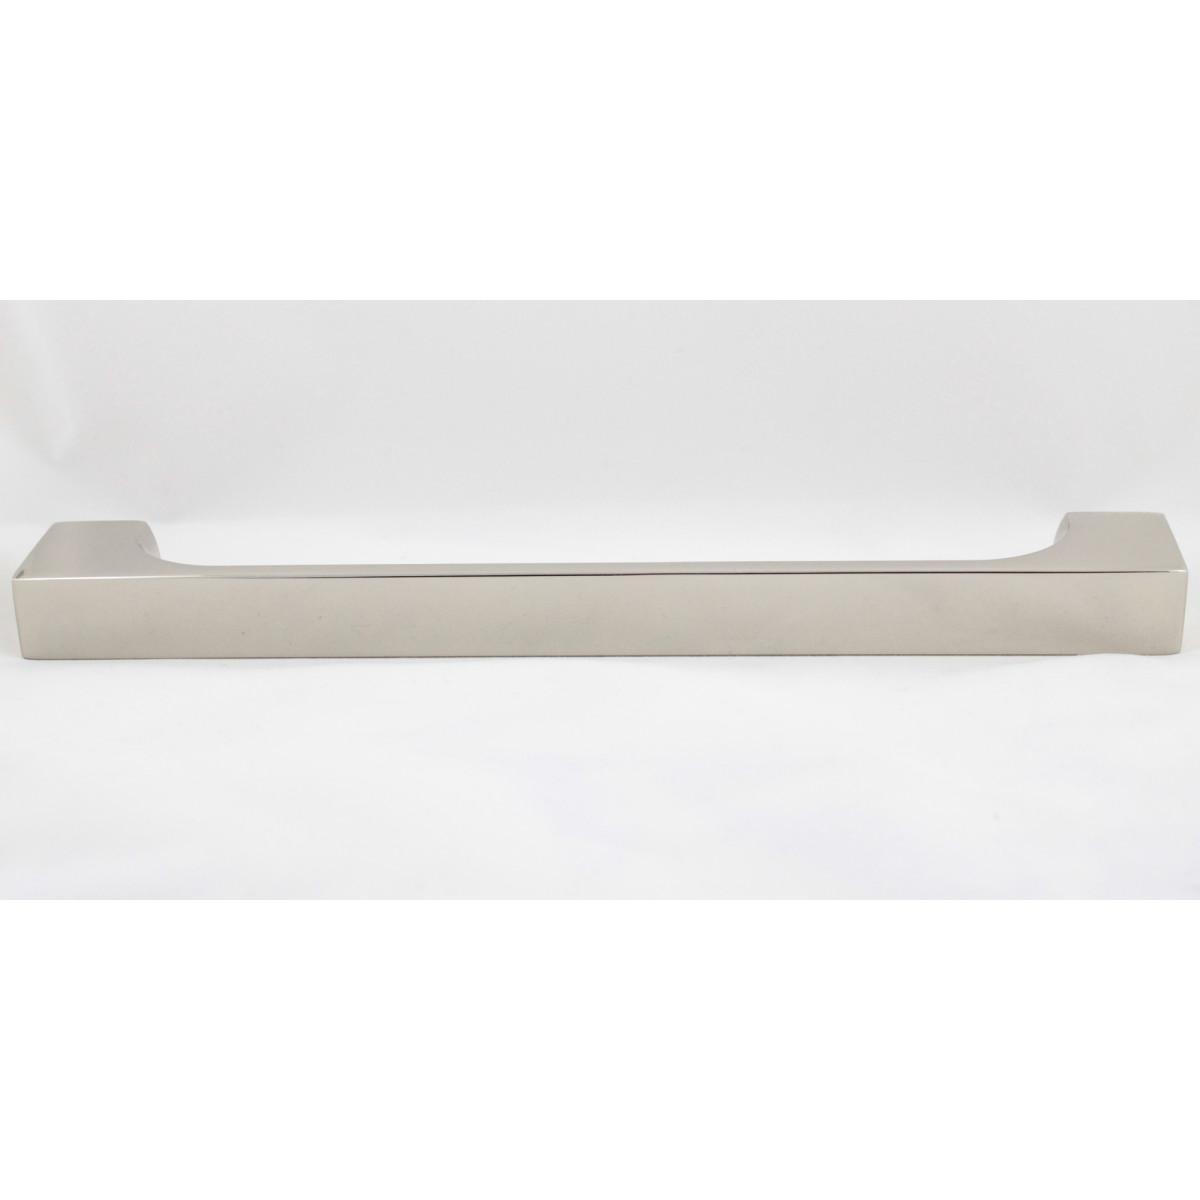 Ручка-Скоба Modda 224 Латунь Никель Pizza-830-41-224